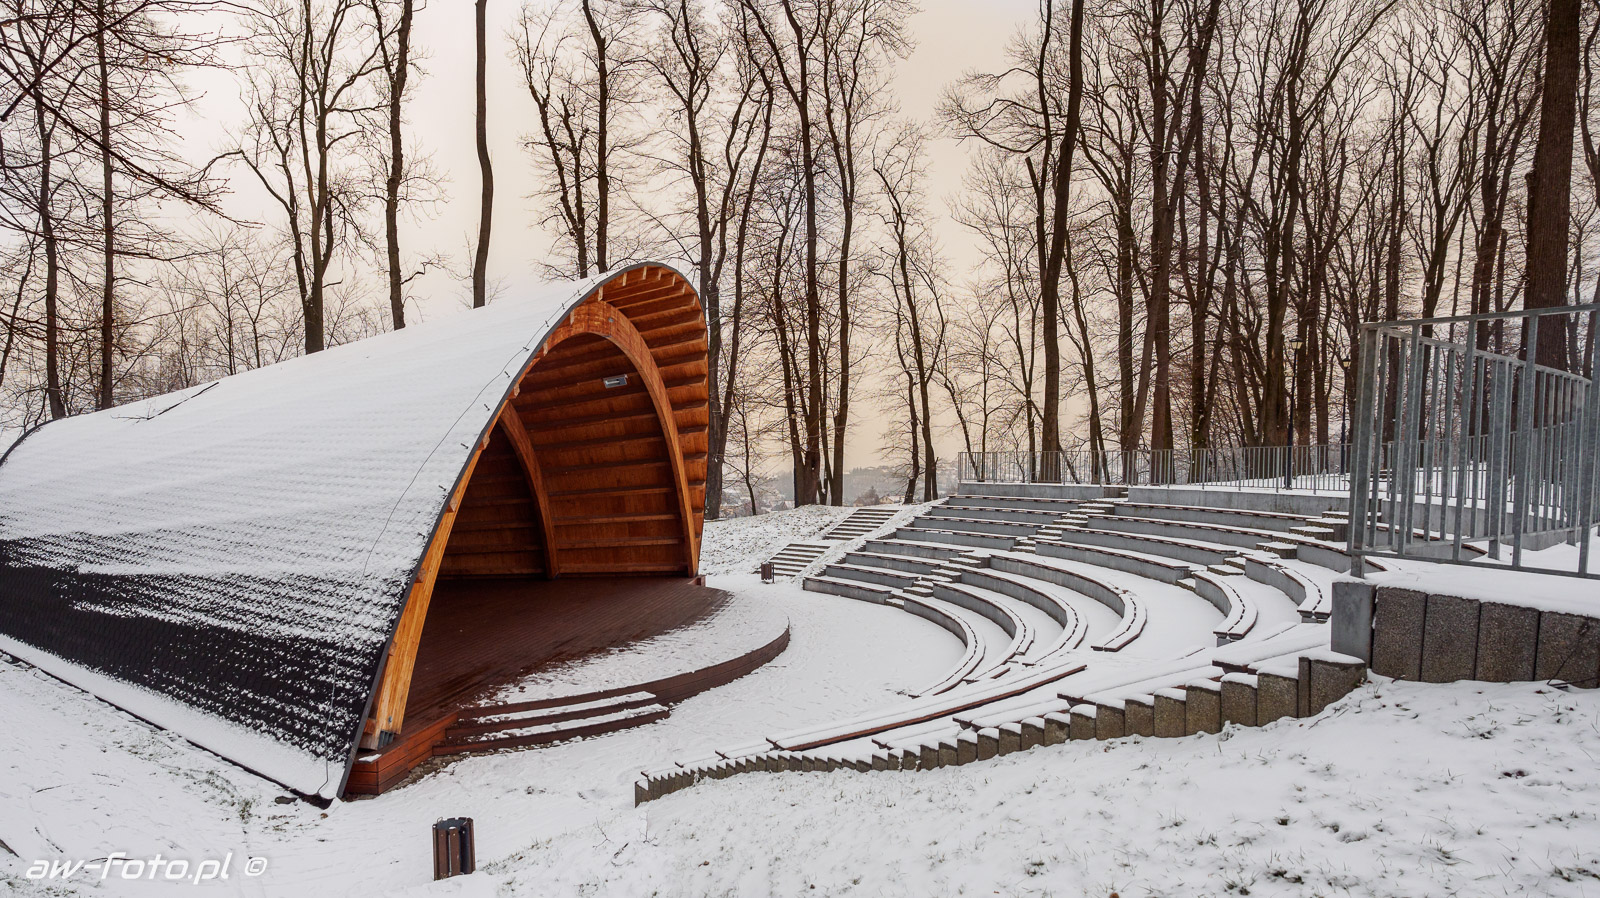 Uzbornia Amfiteatr w Bochni